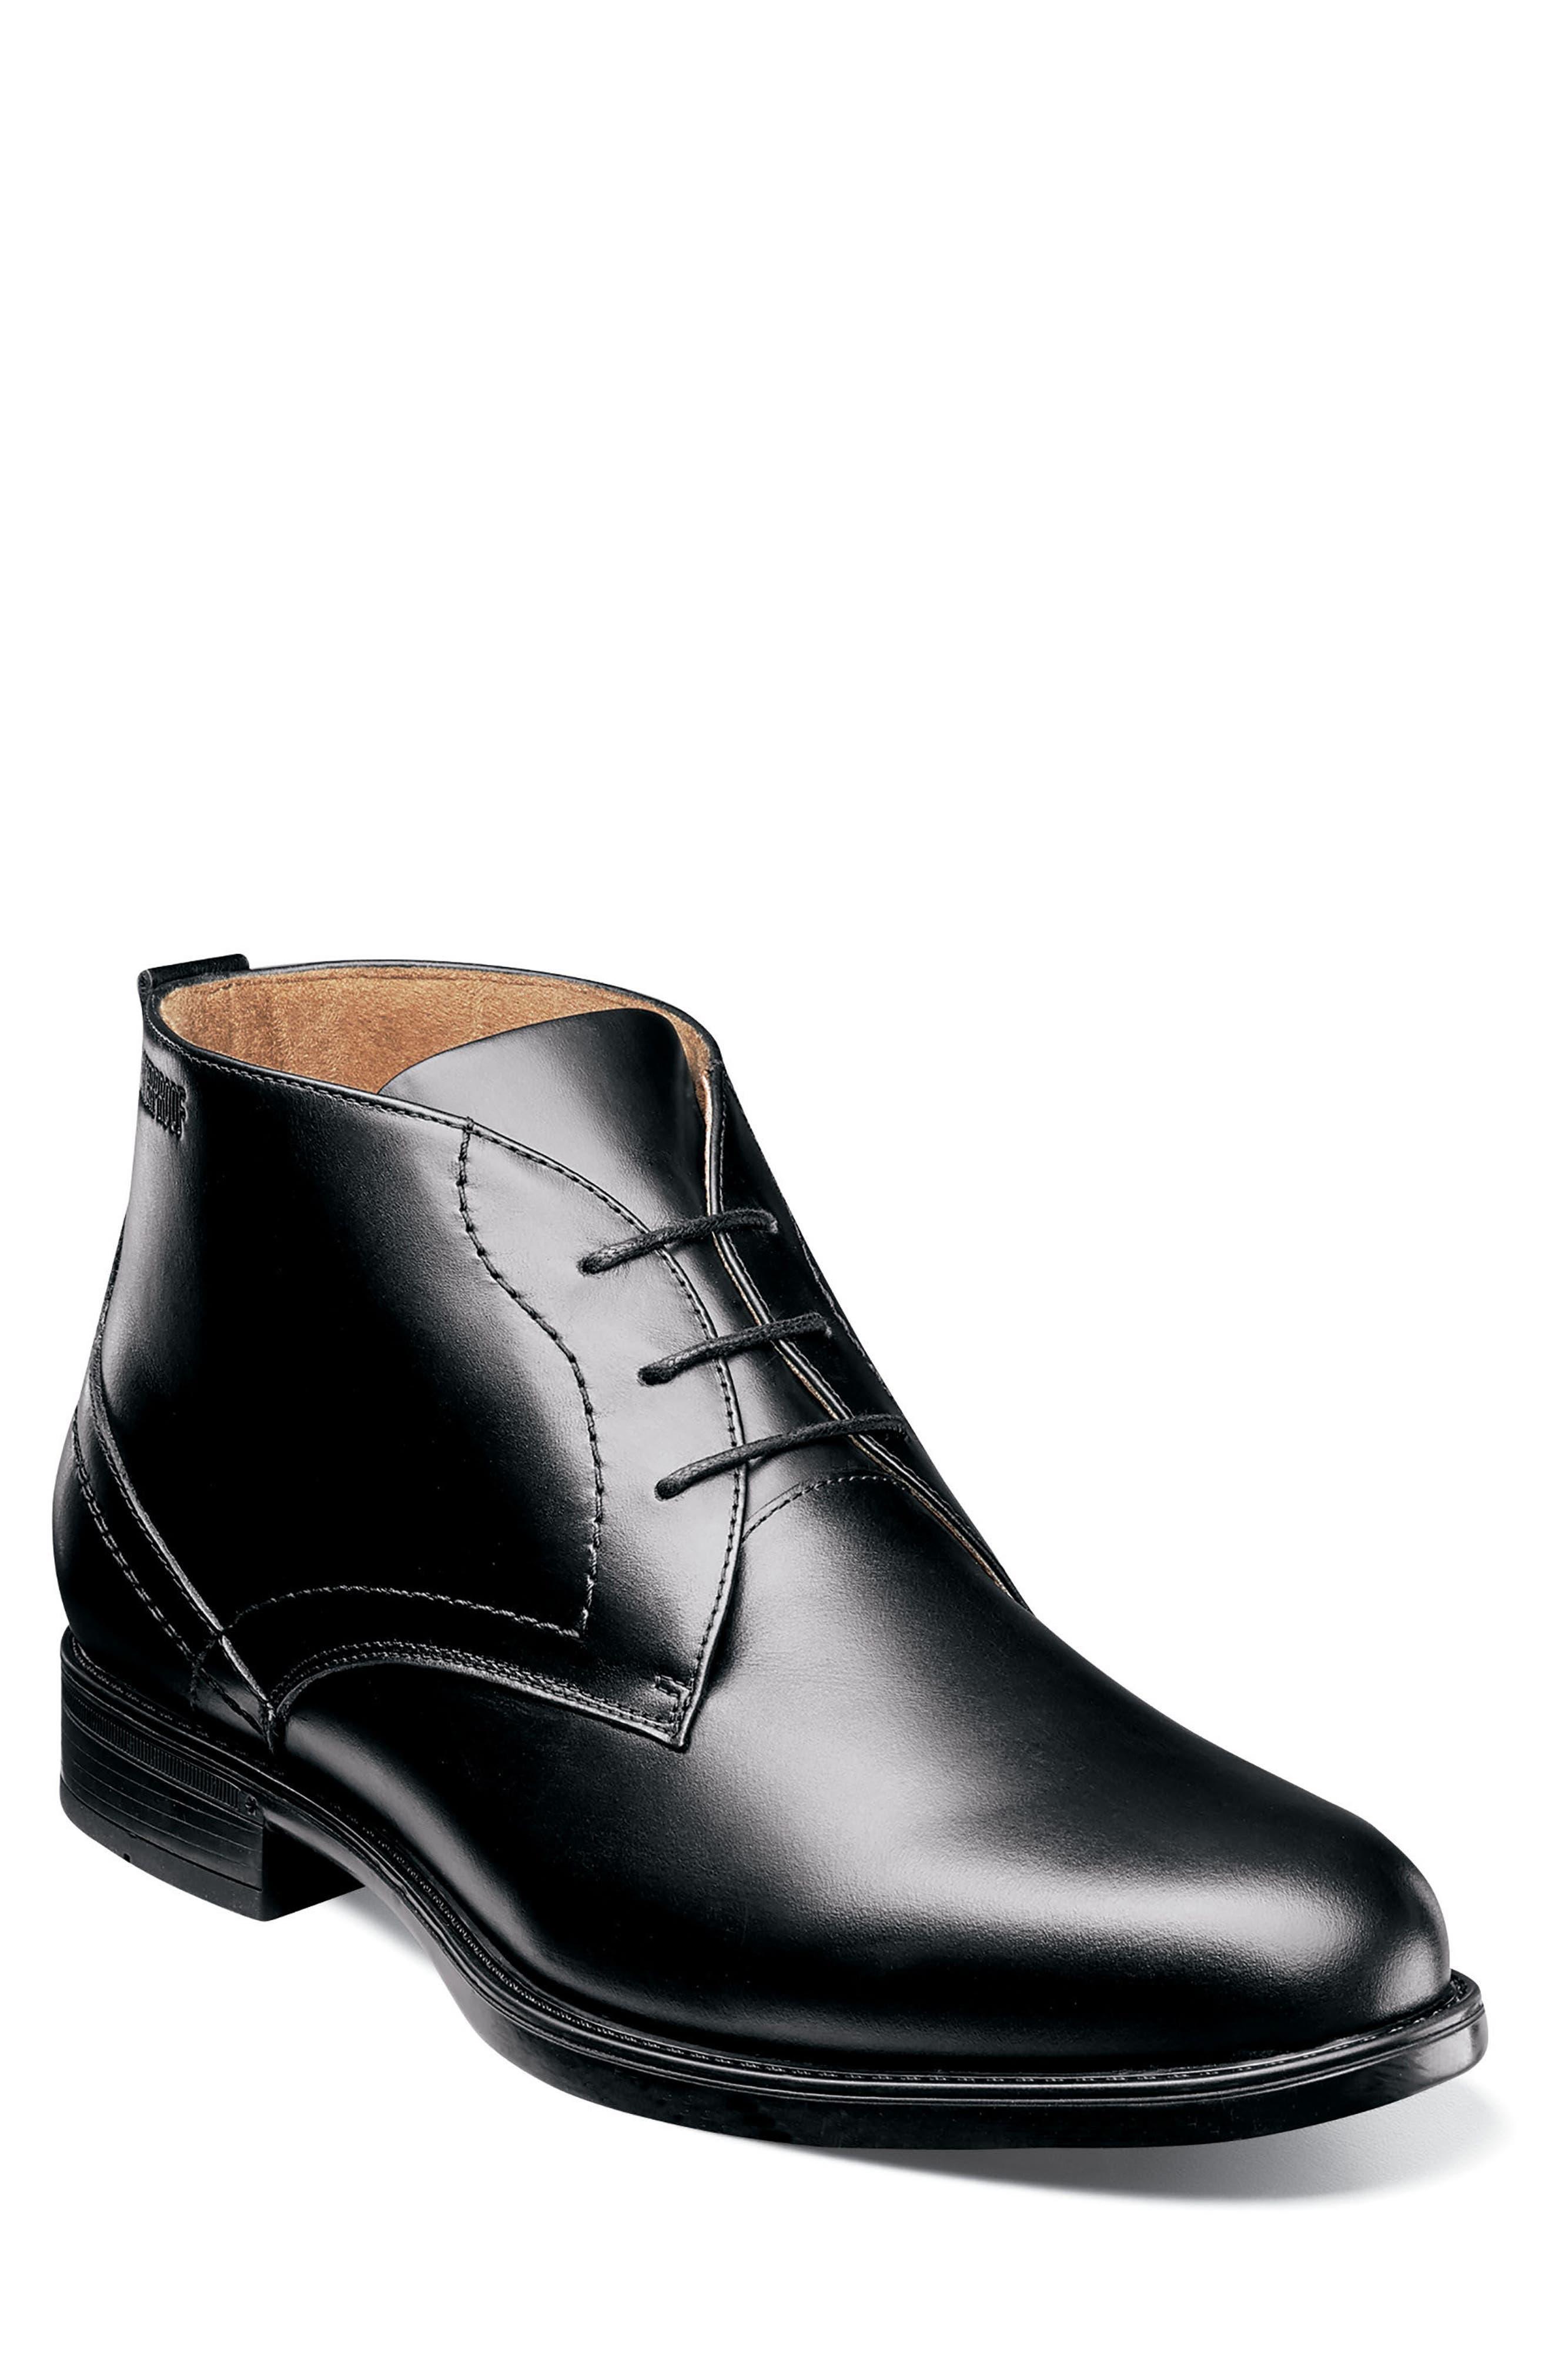 Midtown Waterproof Chukka Boot,                         Main,                         color, BLACK